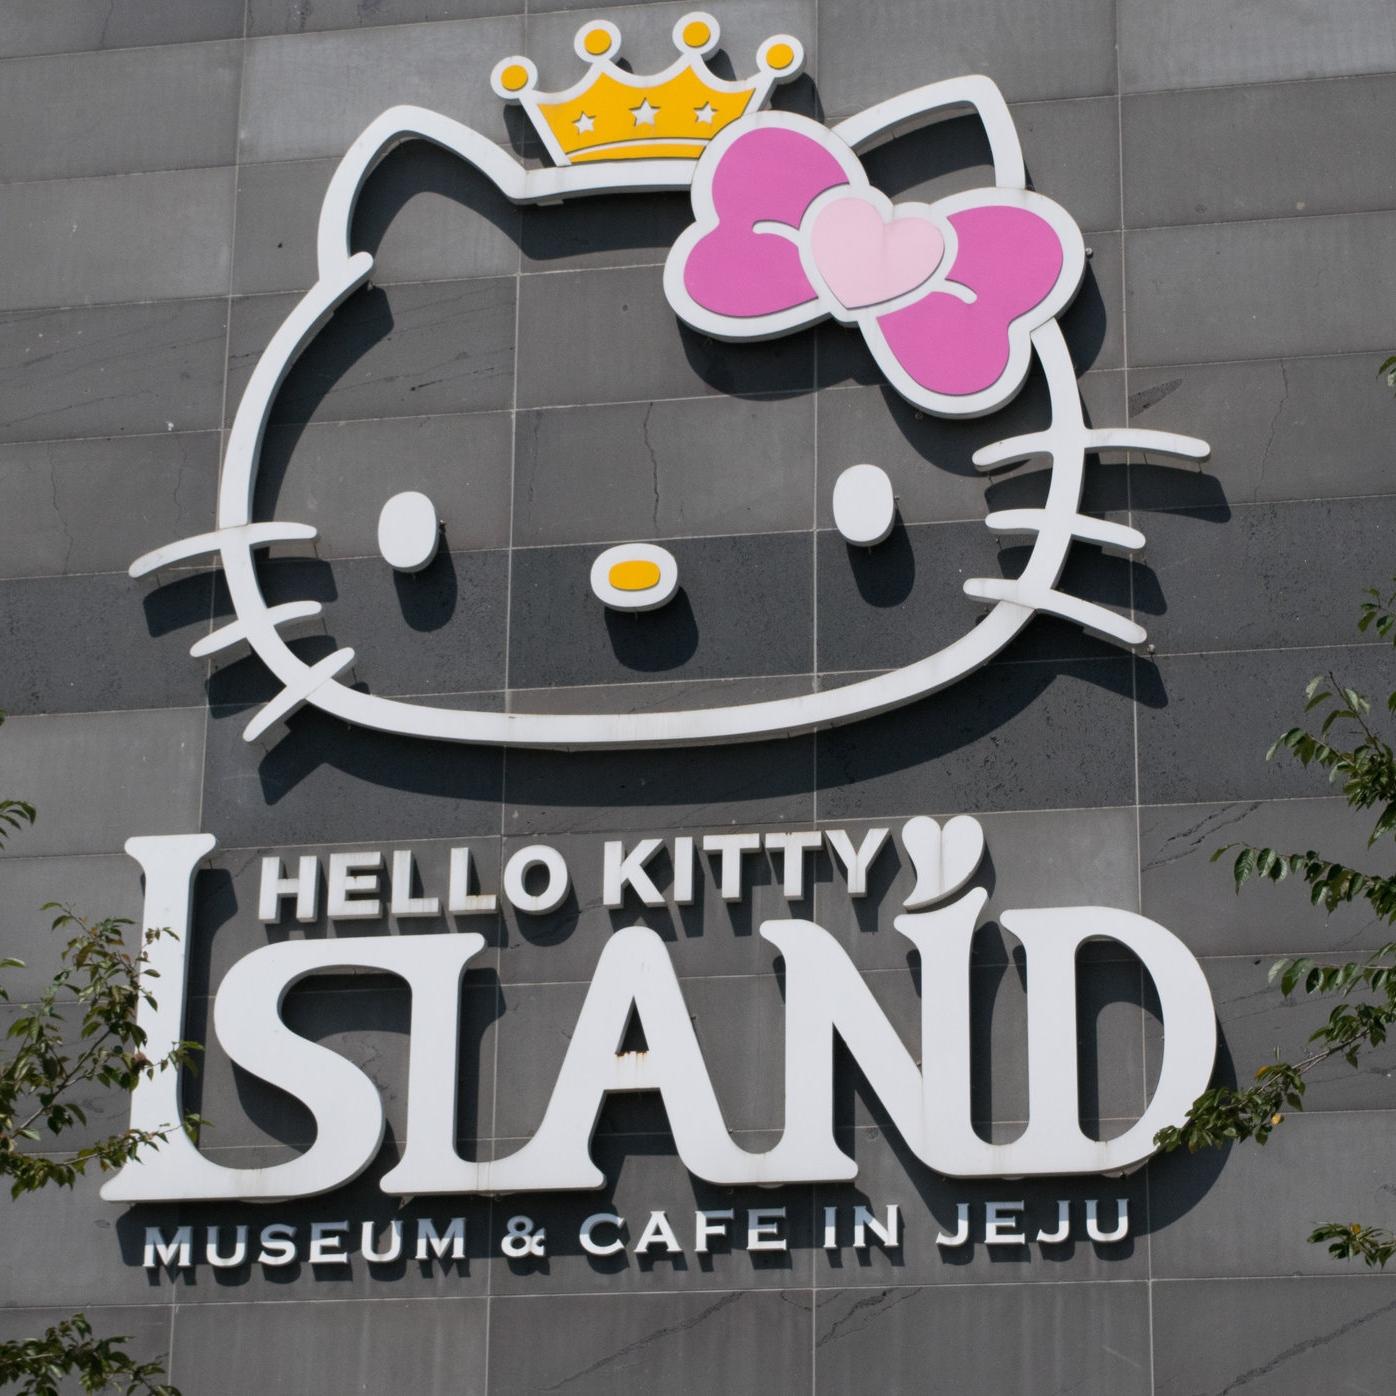 hello kitty island, Jeju